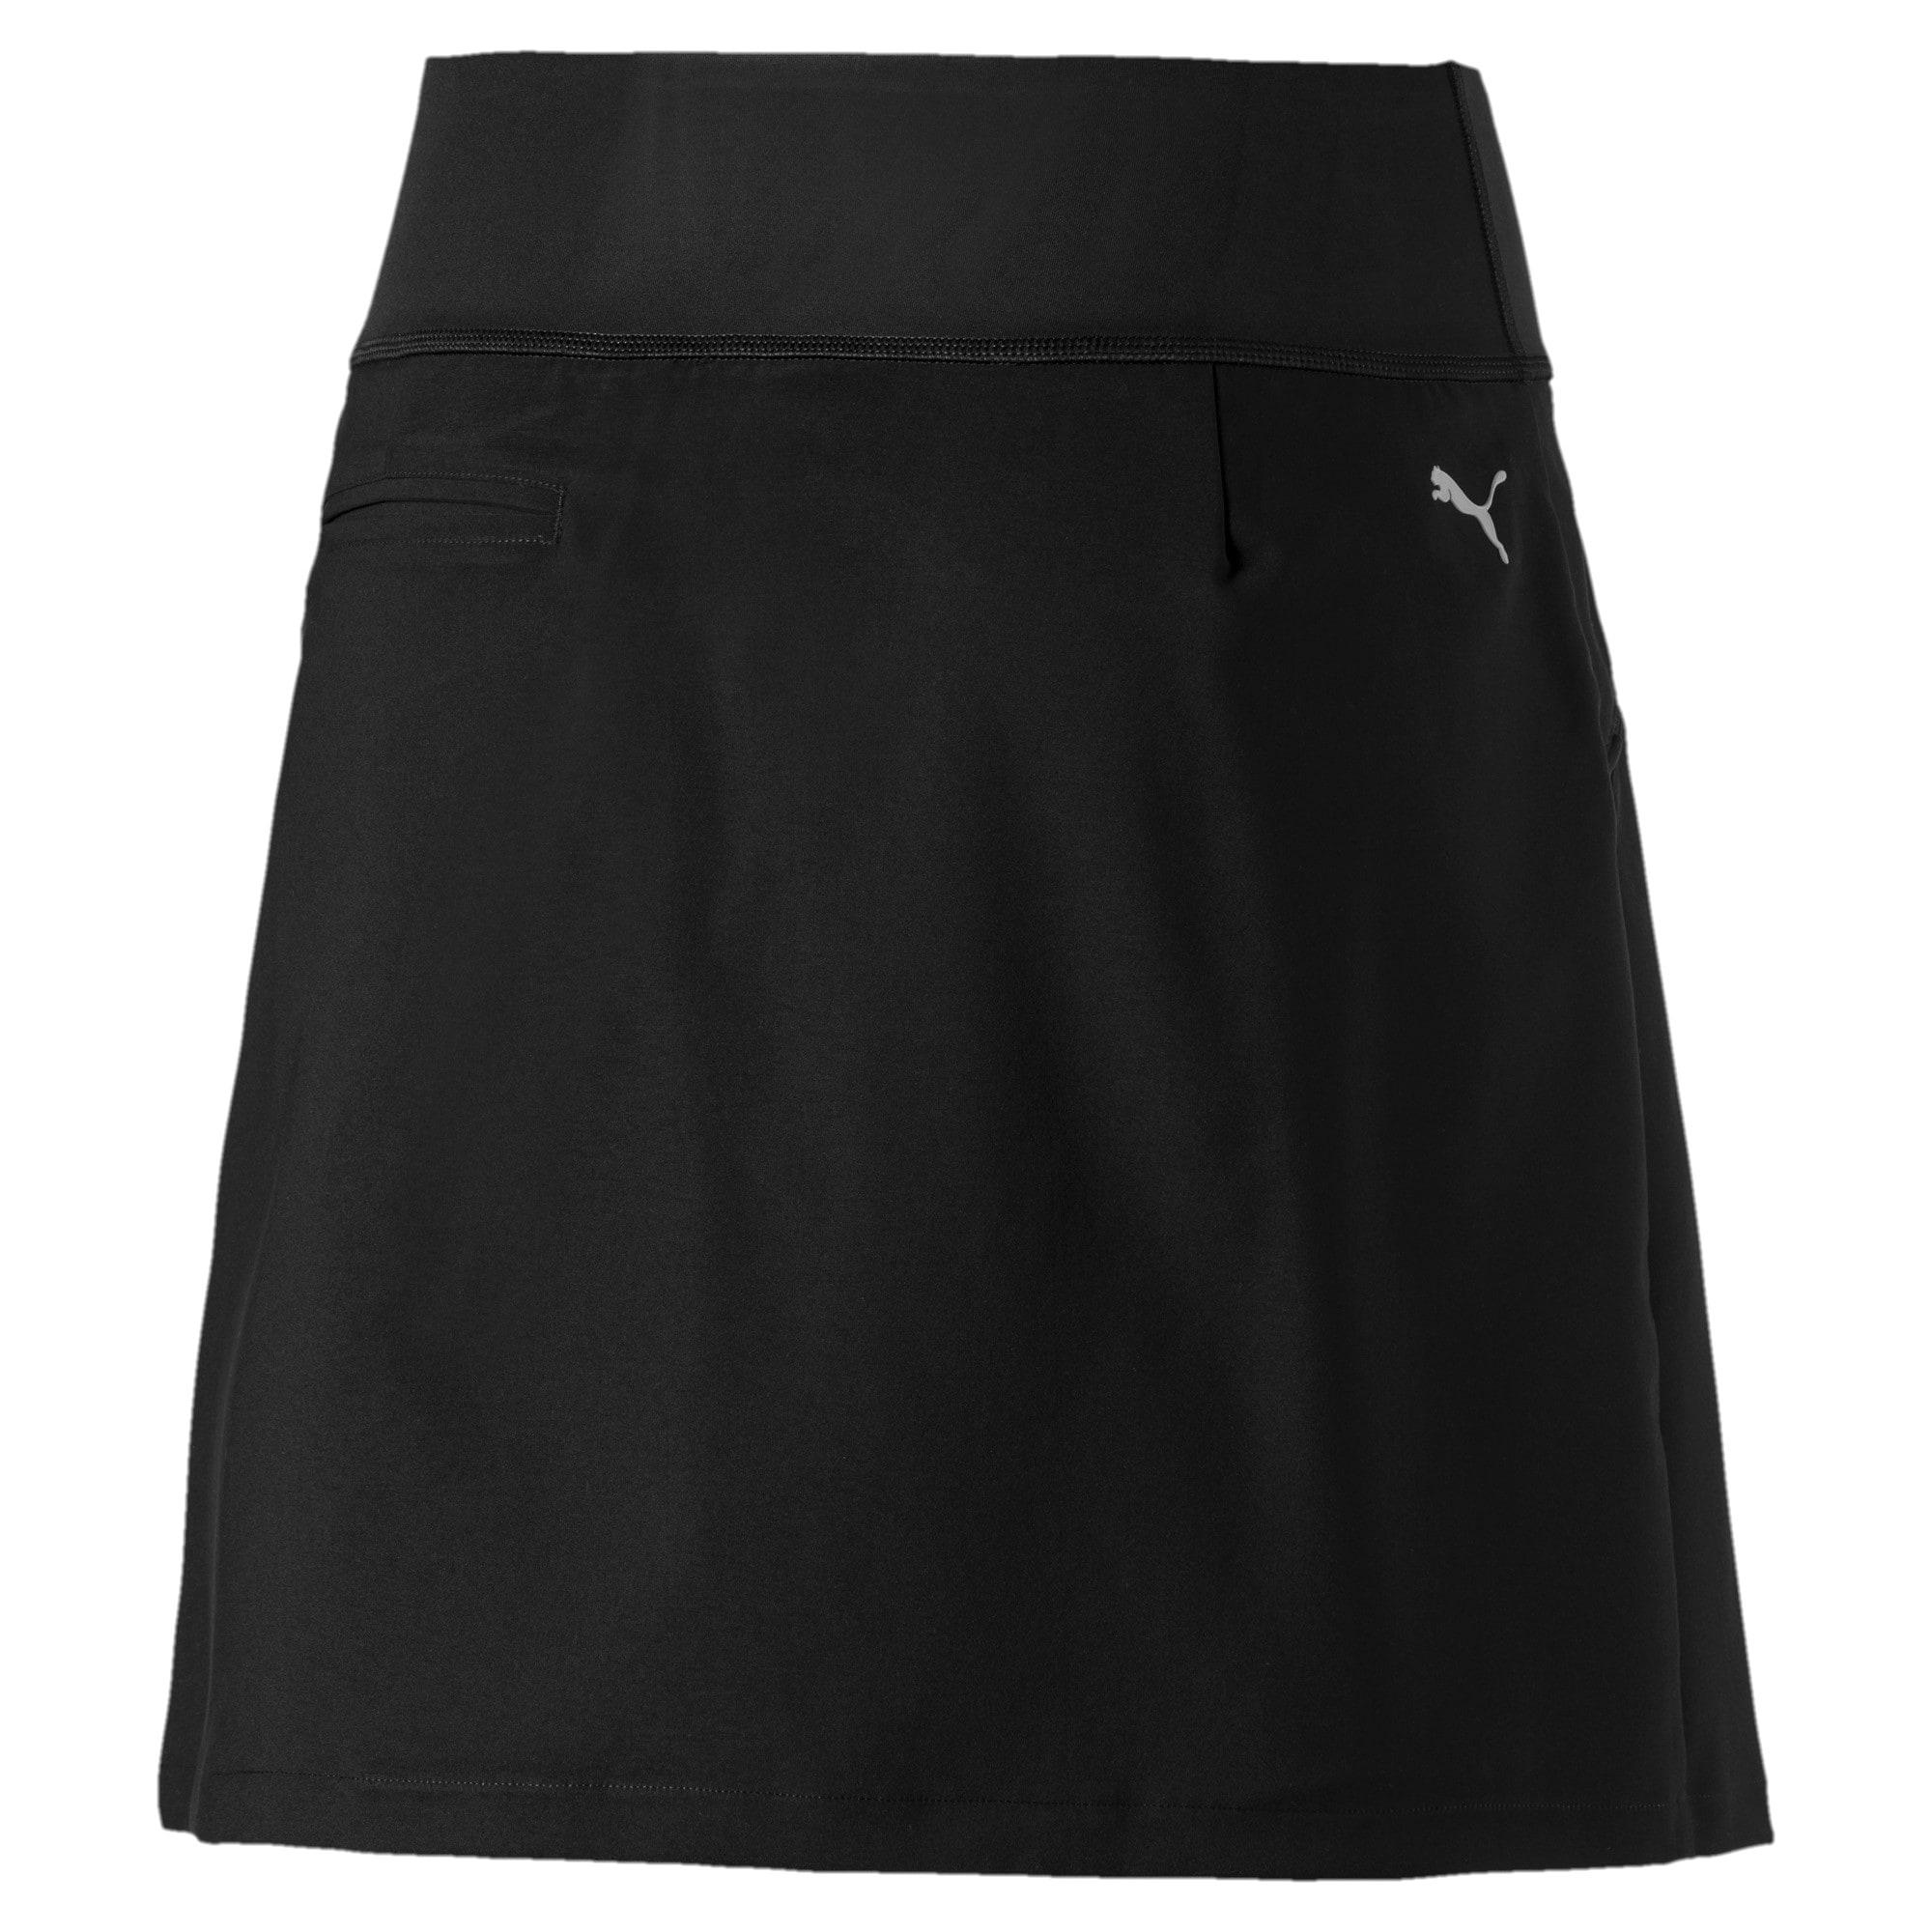 Thumbnail 2 of PWRSHAPE 18 Inch Women's Golf Skirt, Puma Black, medium